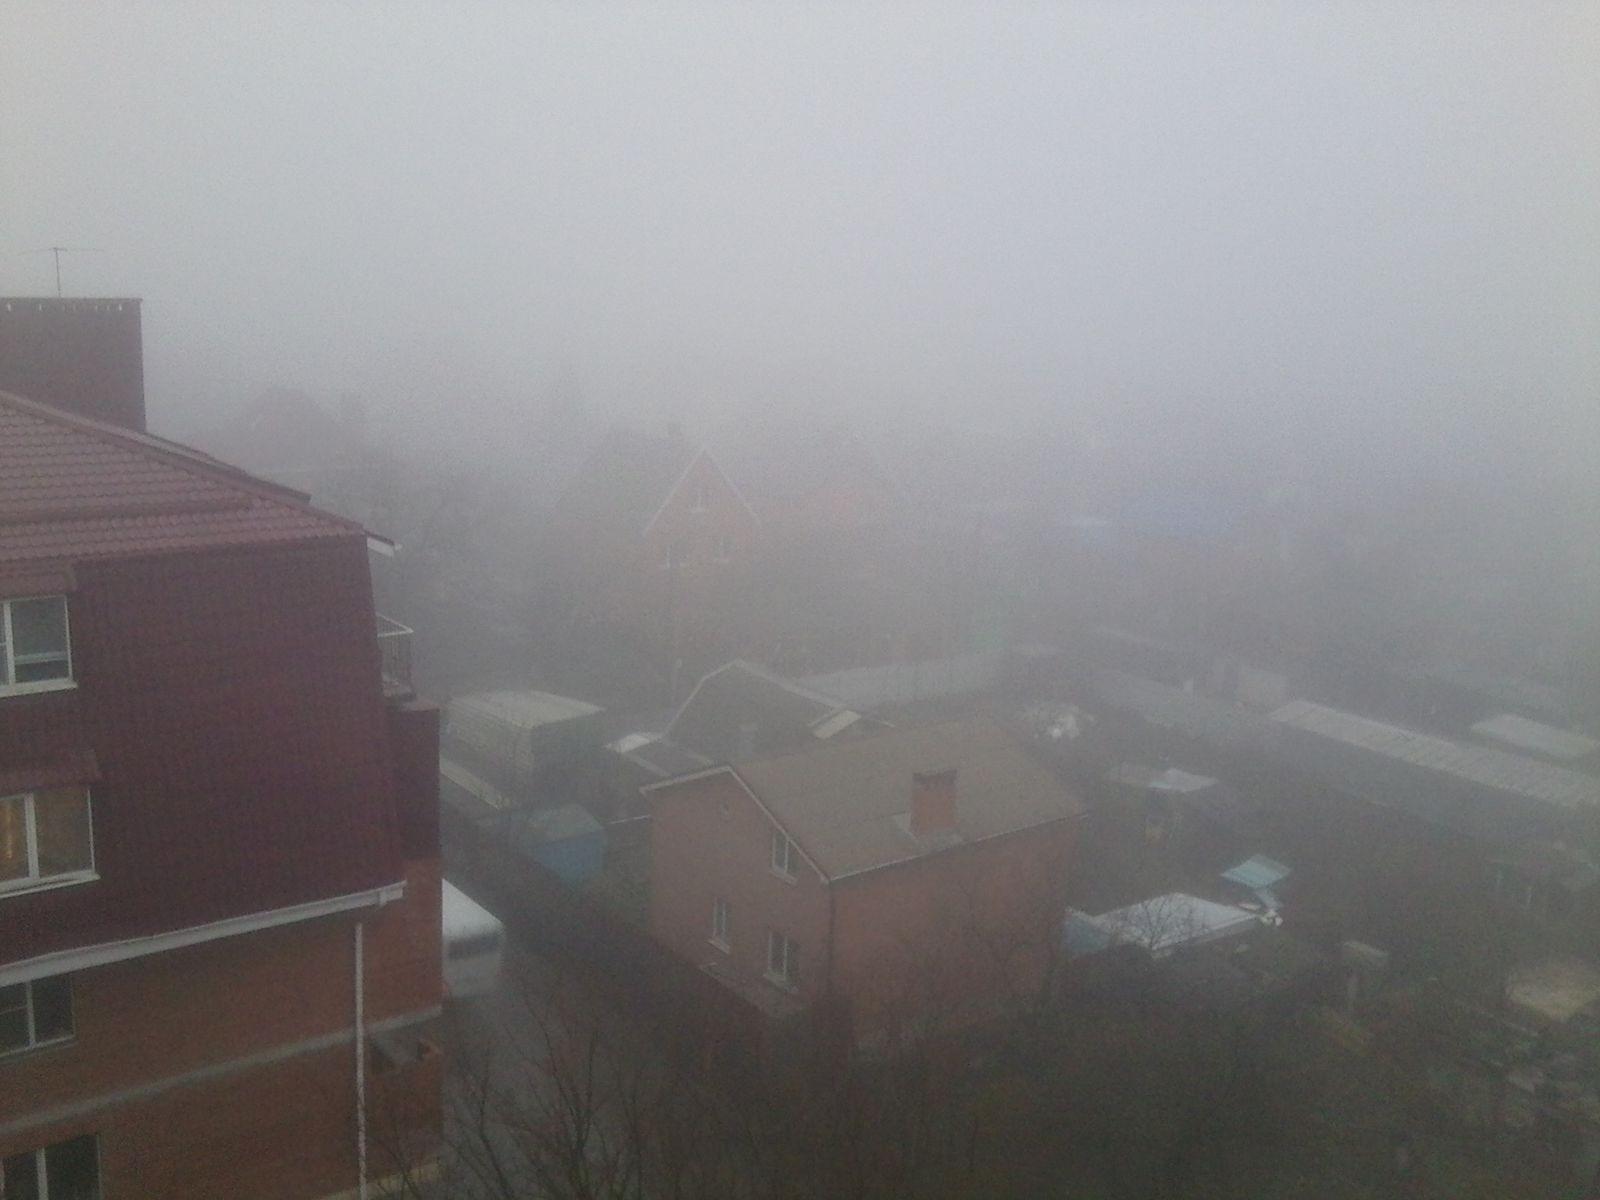 ВРостове-на-Дону из-за тумана задержаны три авиарейса